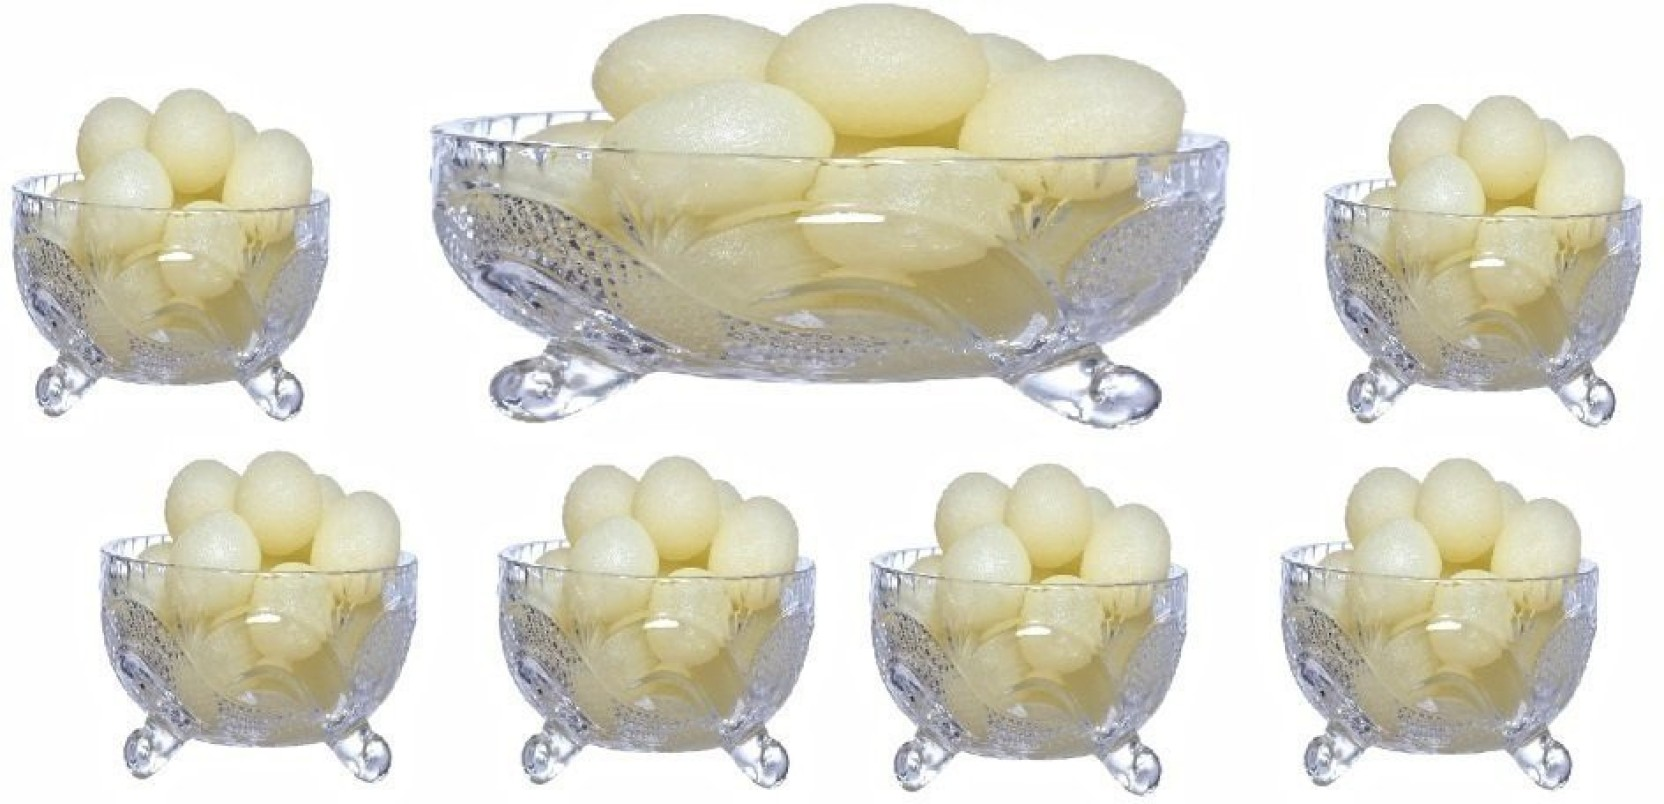 Ezra Designer Transparent Beautiful Crystal Pudding Set Serving Claire Ivory Nokha Wedges Women 39 Add To Cart